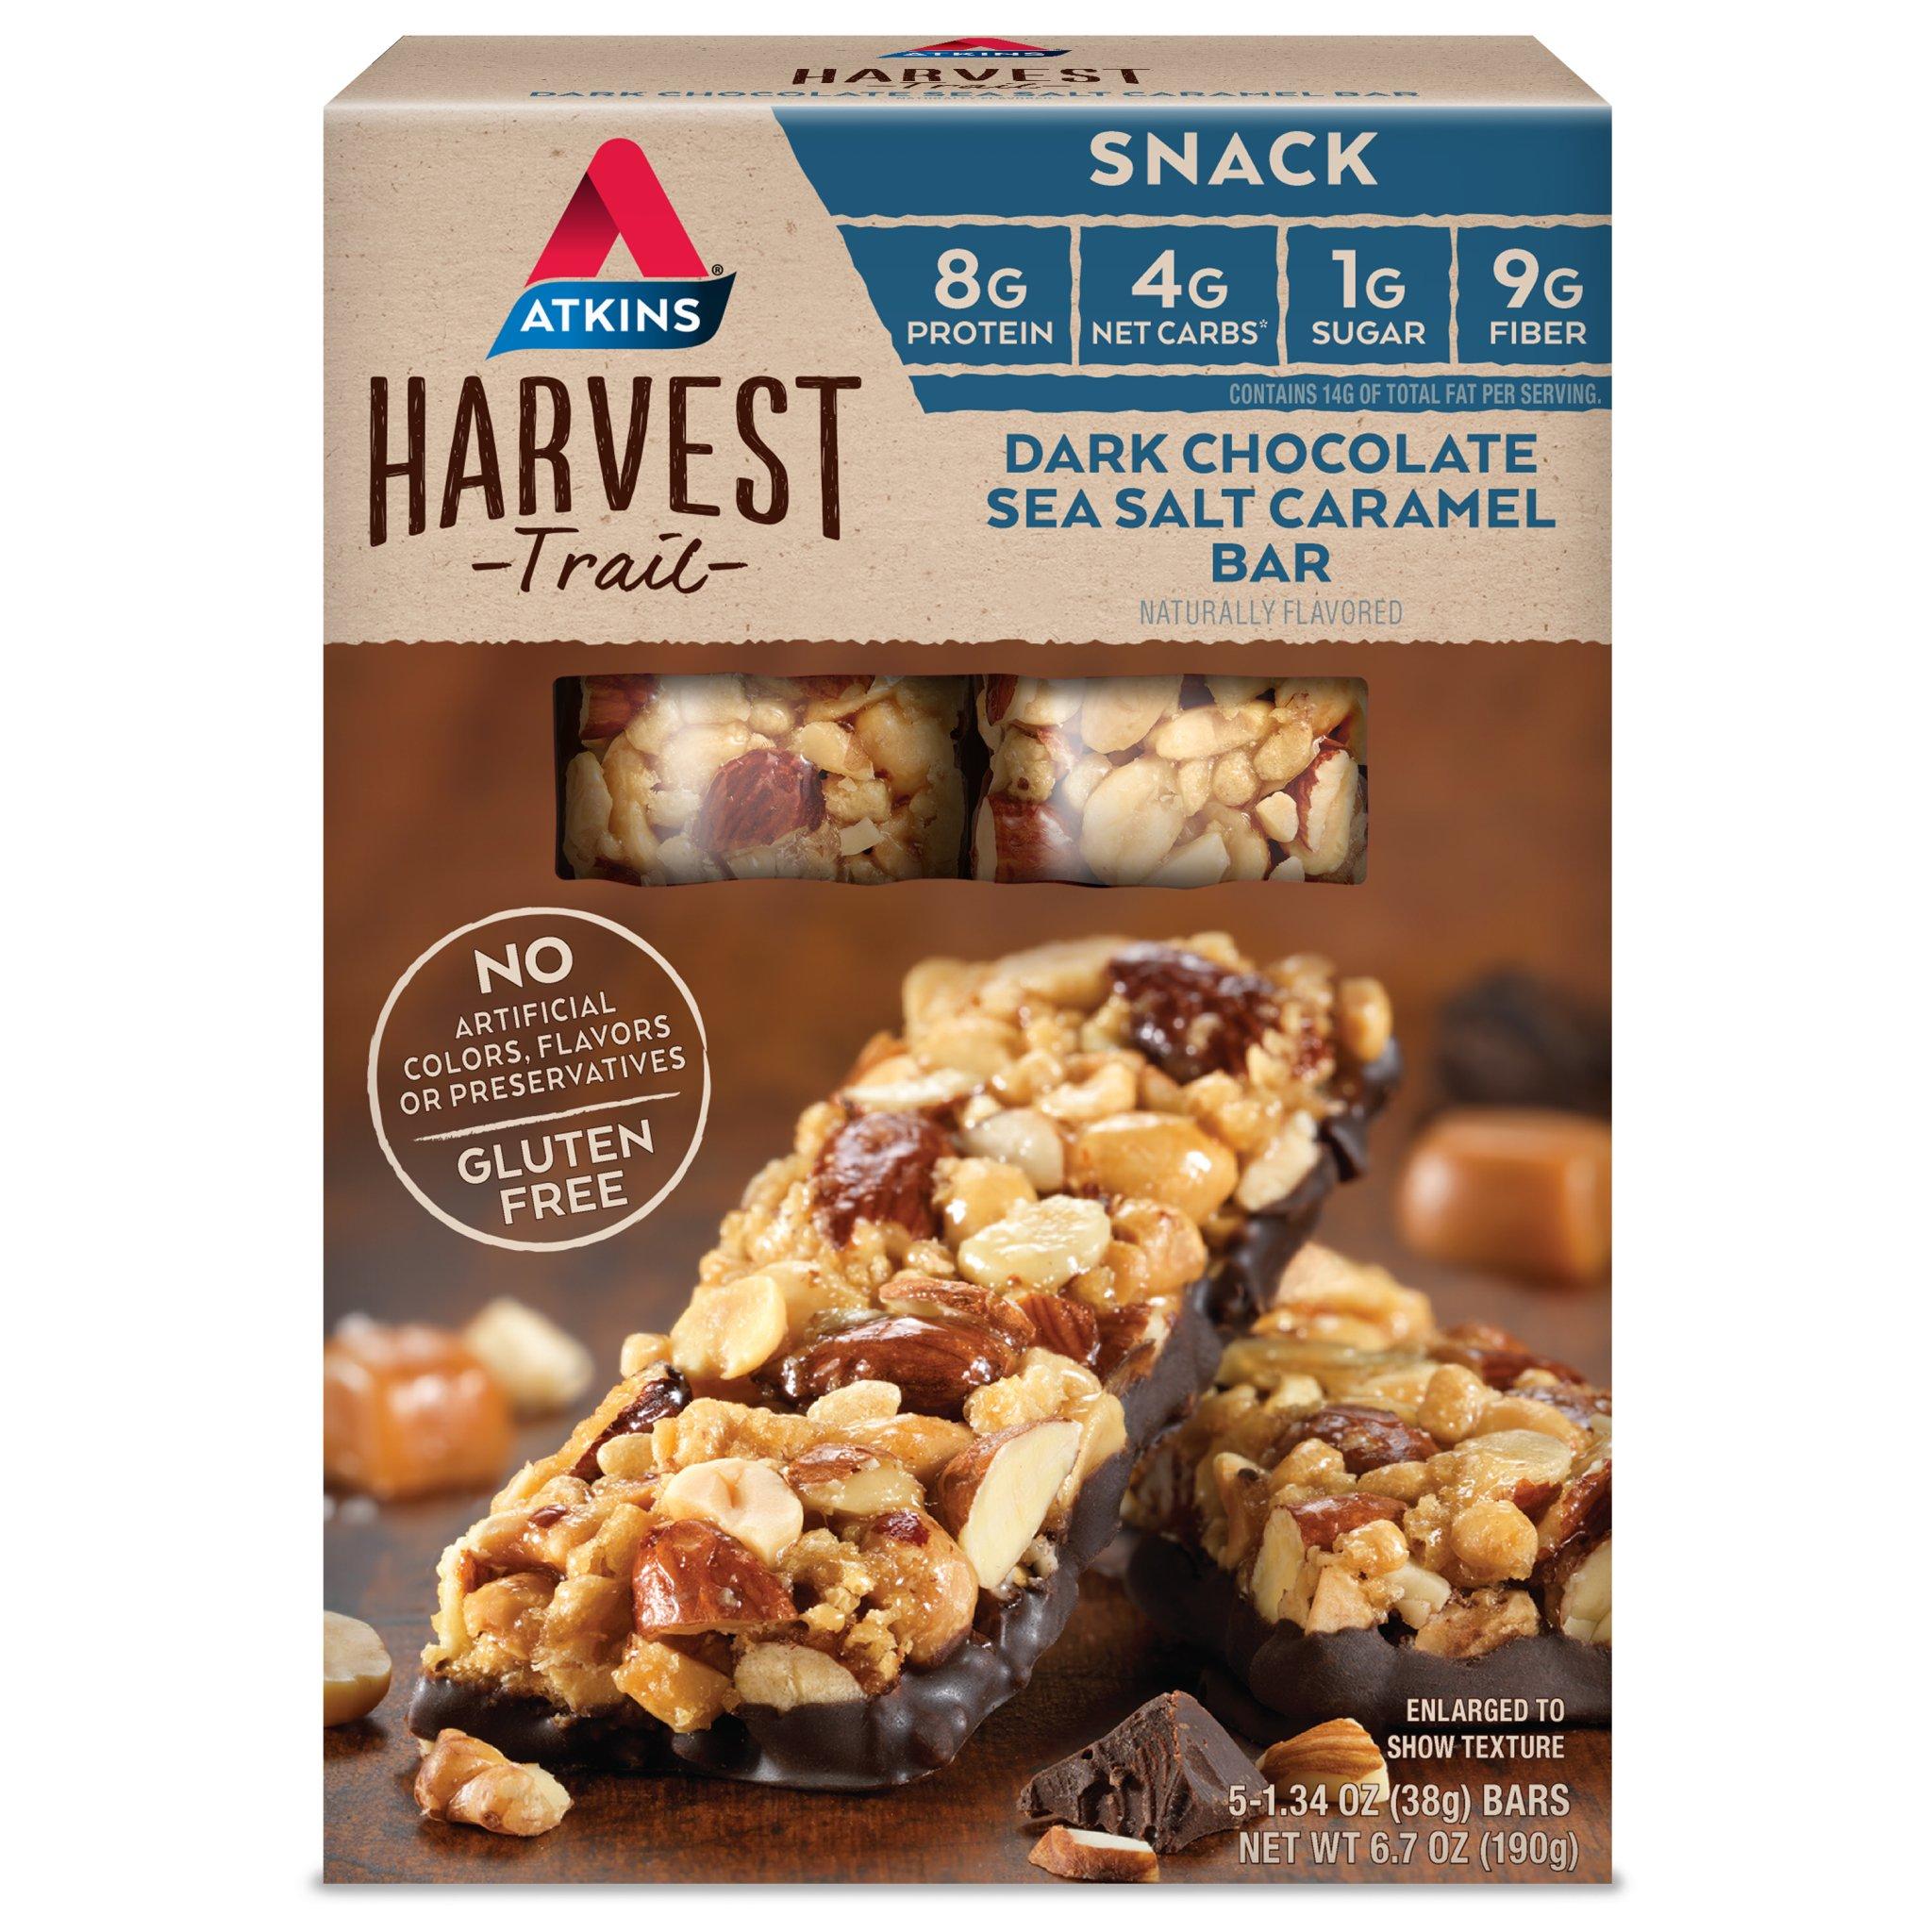 Atkins Gluten Free Harvest Trail Snack Bar, Dark Chocolate Sea Salt Caramel, Keto Friendly, 5 Count by Atkins